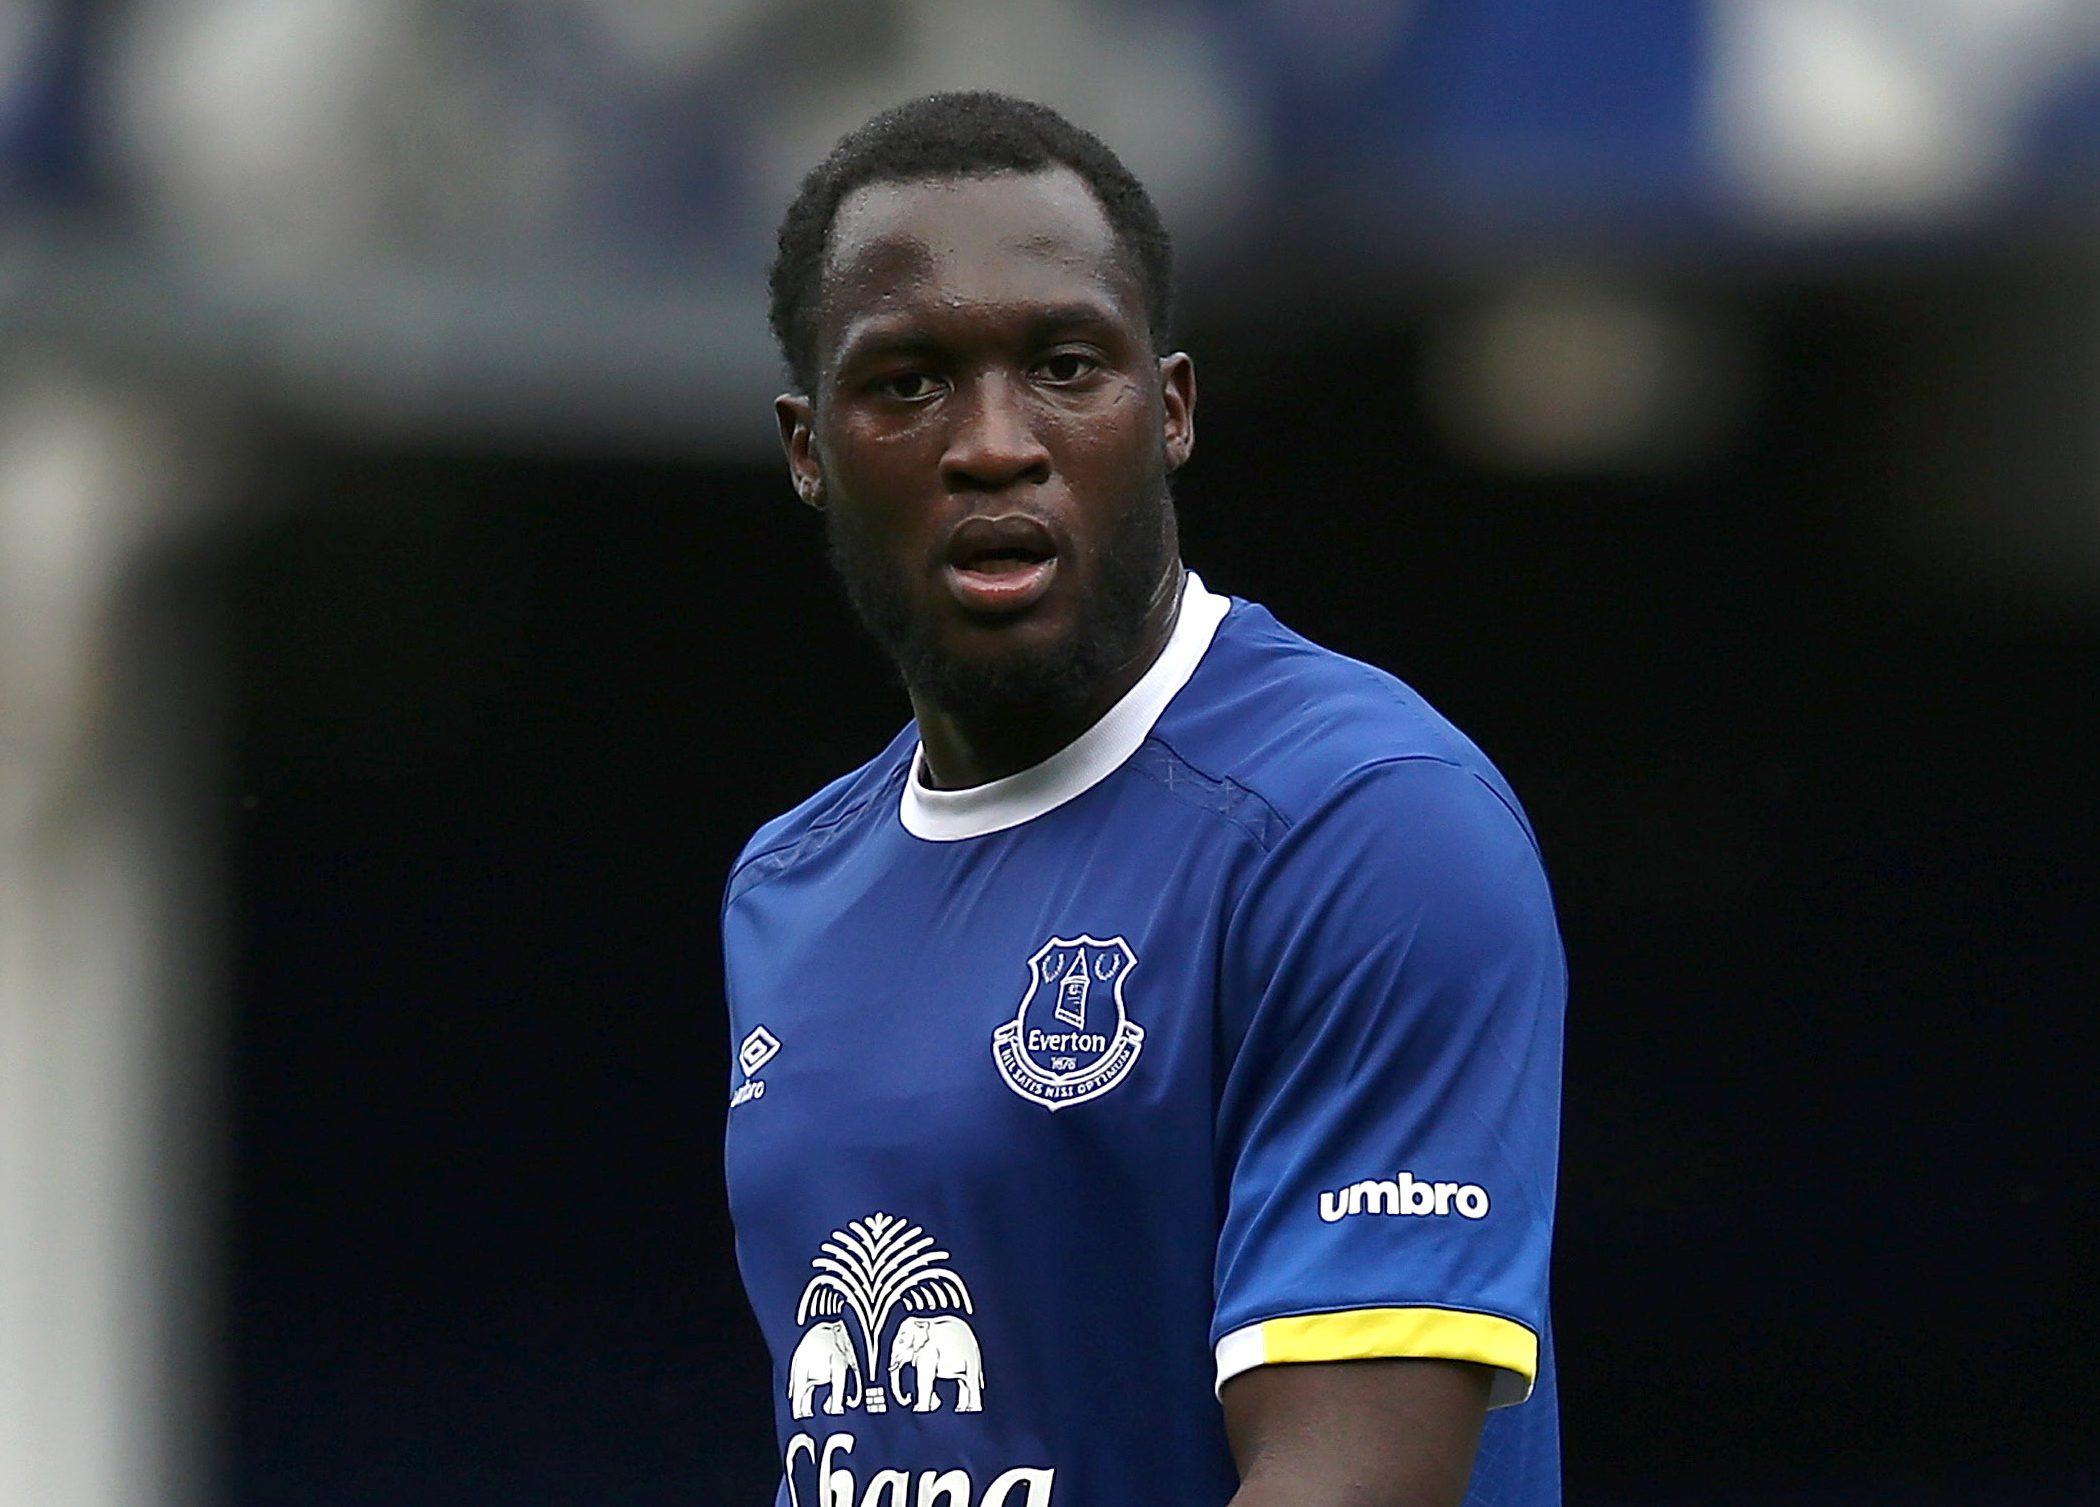 Romelu Lukaku out of Everton's opening game vs Tottenham